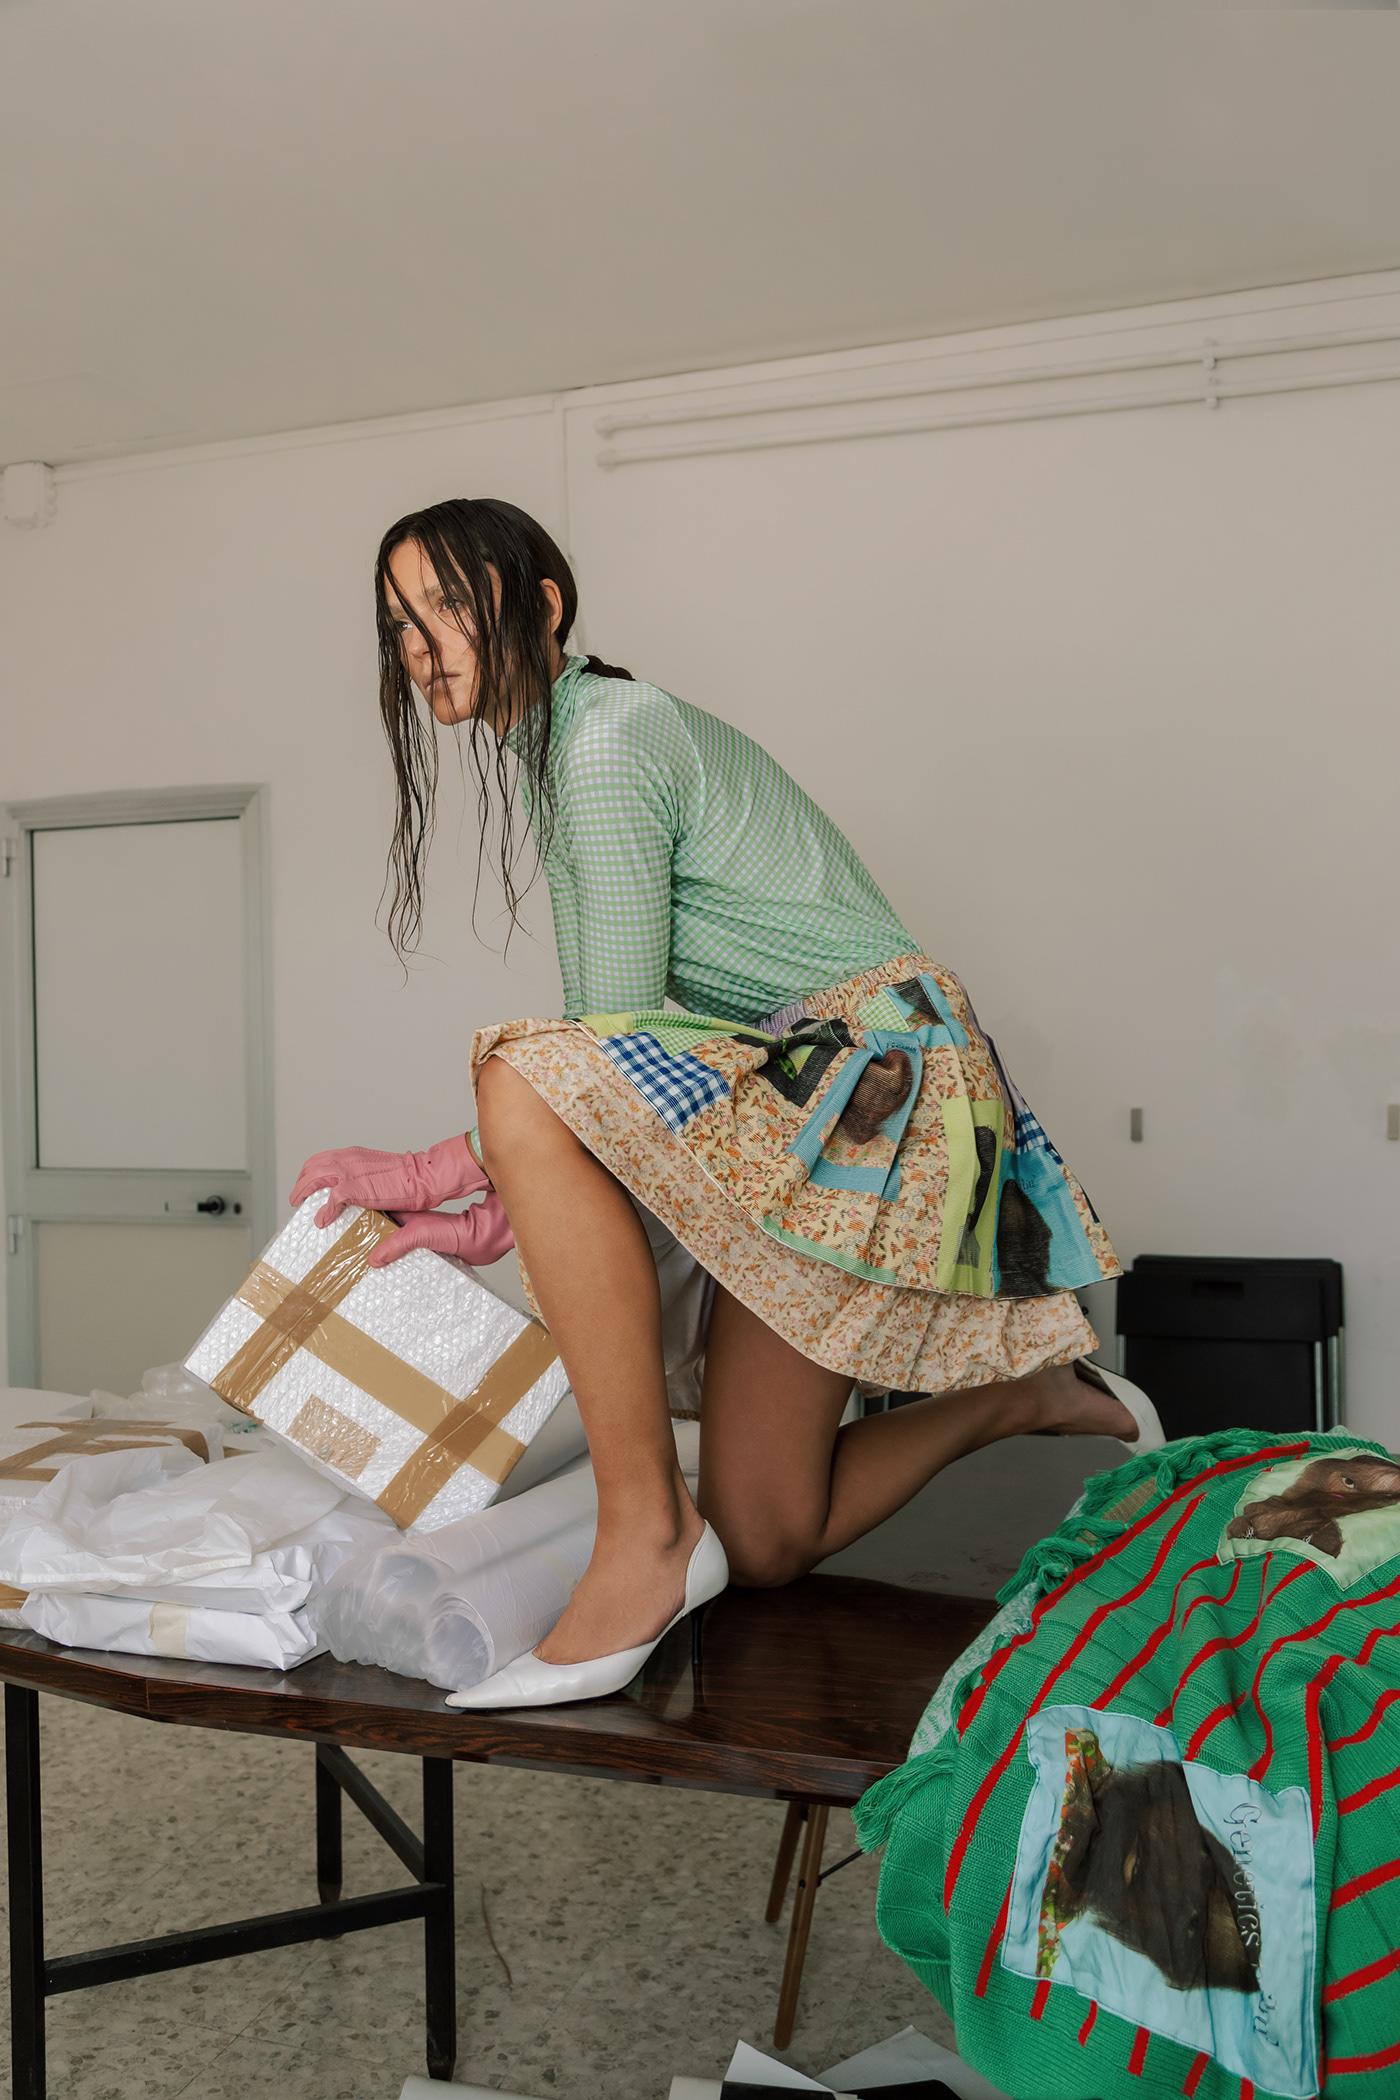 Dangerous Unpacking for PAP MAGAZINE